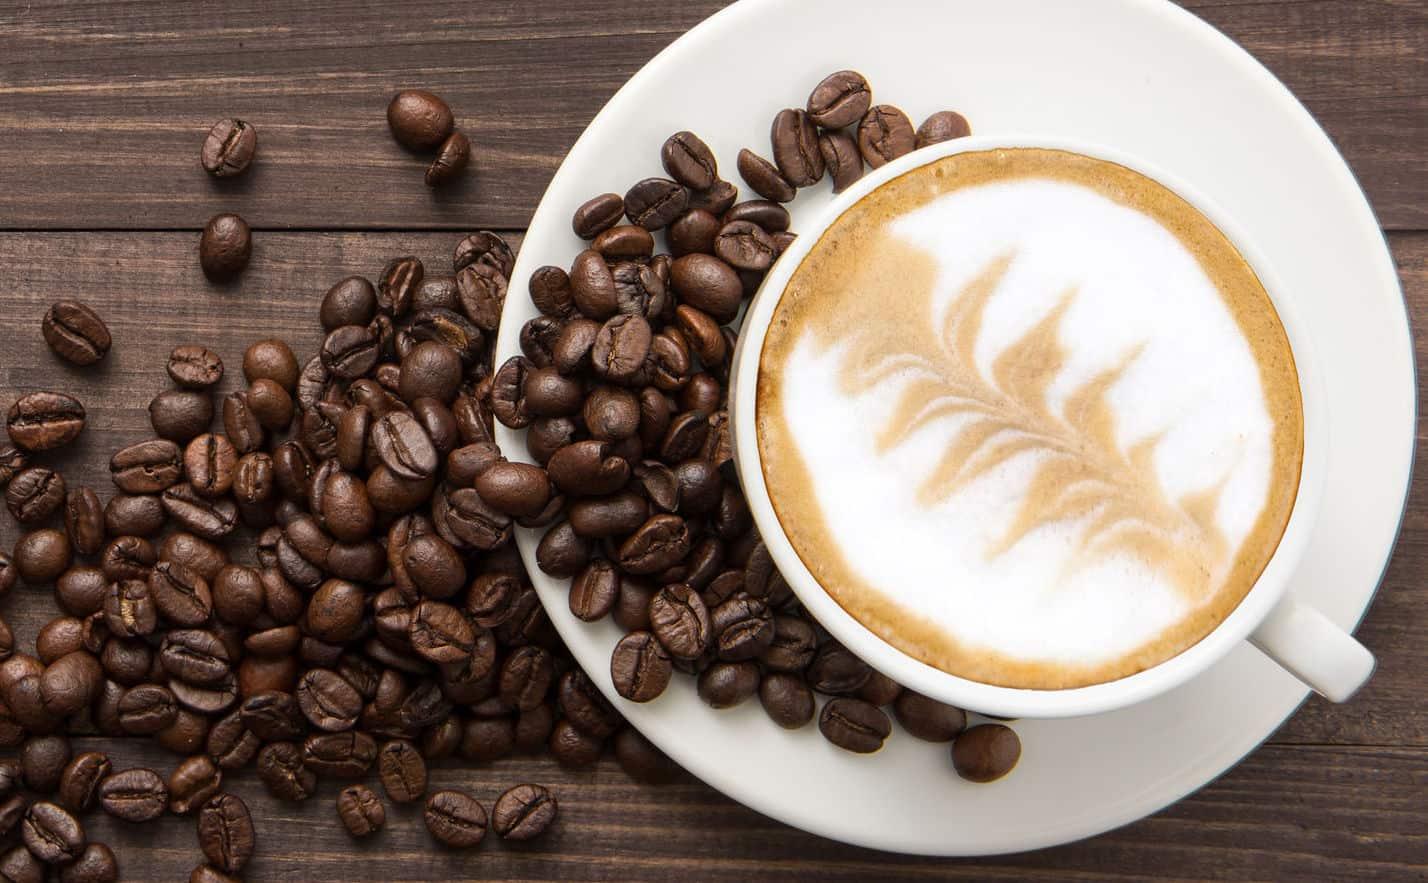 macchina-caffè-capsule-principale-xcyp1